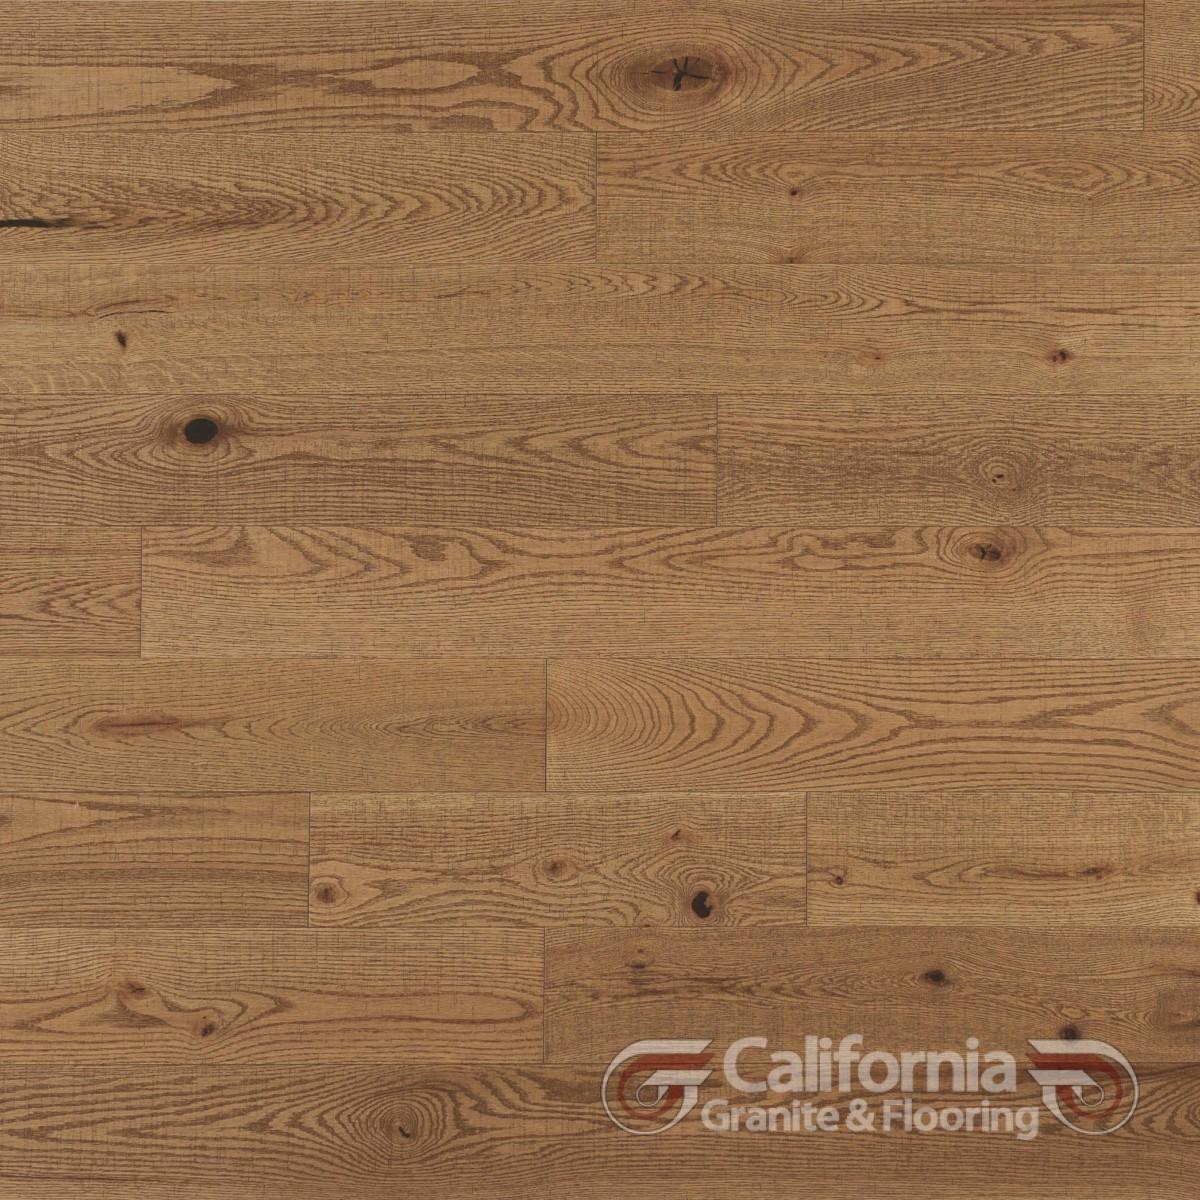 hardwood-flooring-red-oak-papyrus-character-cork-look-2